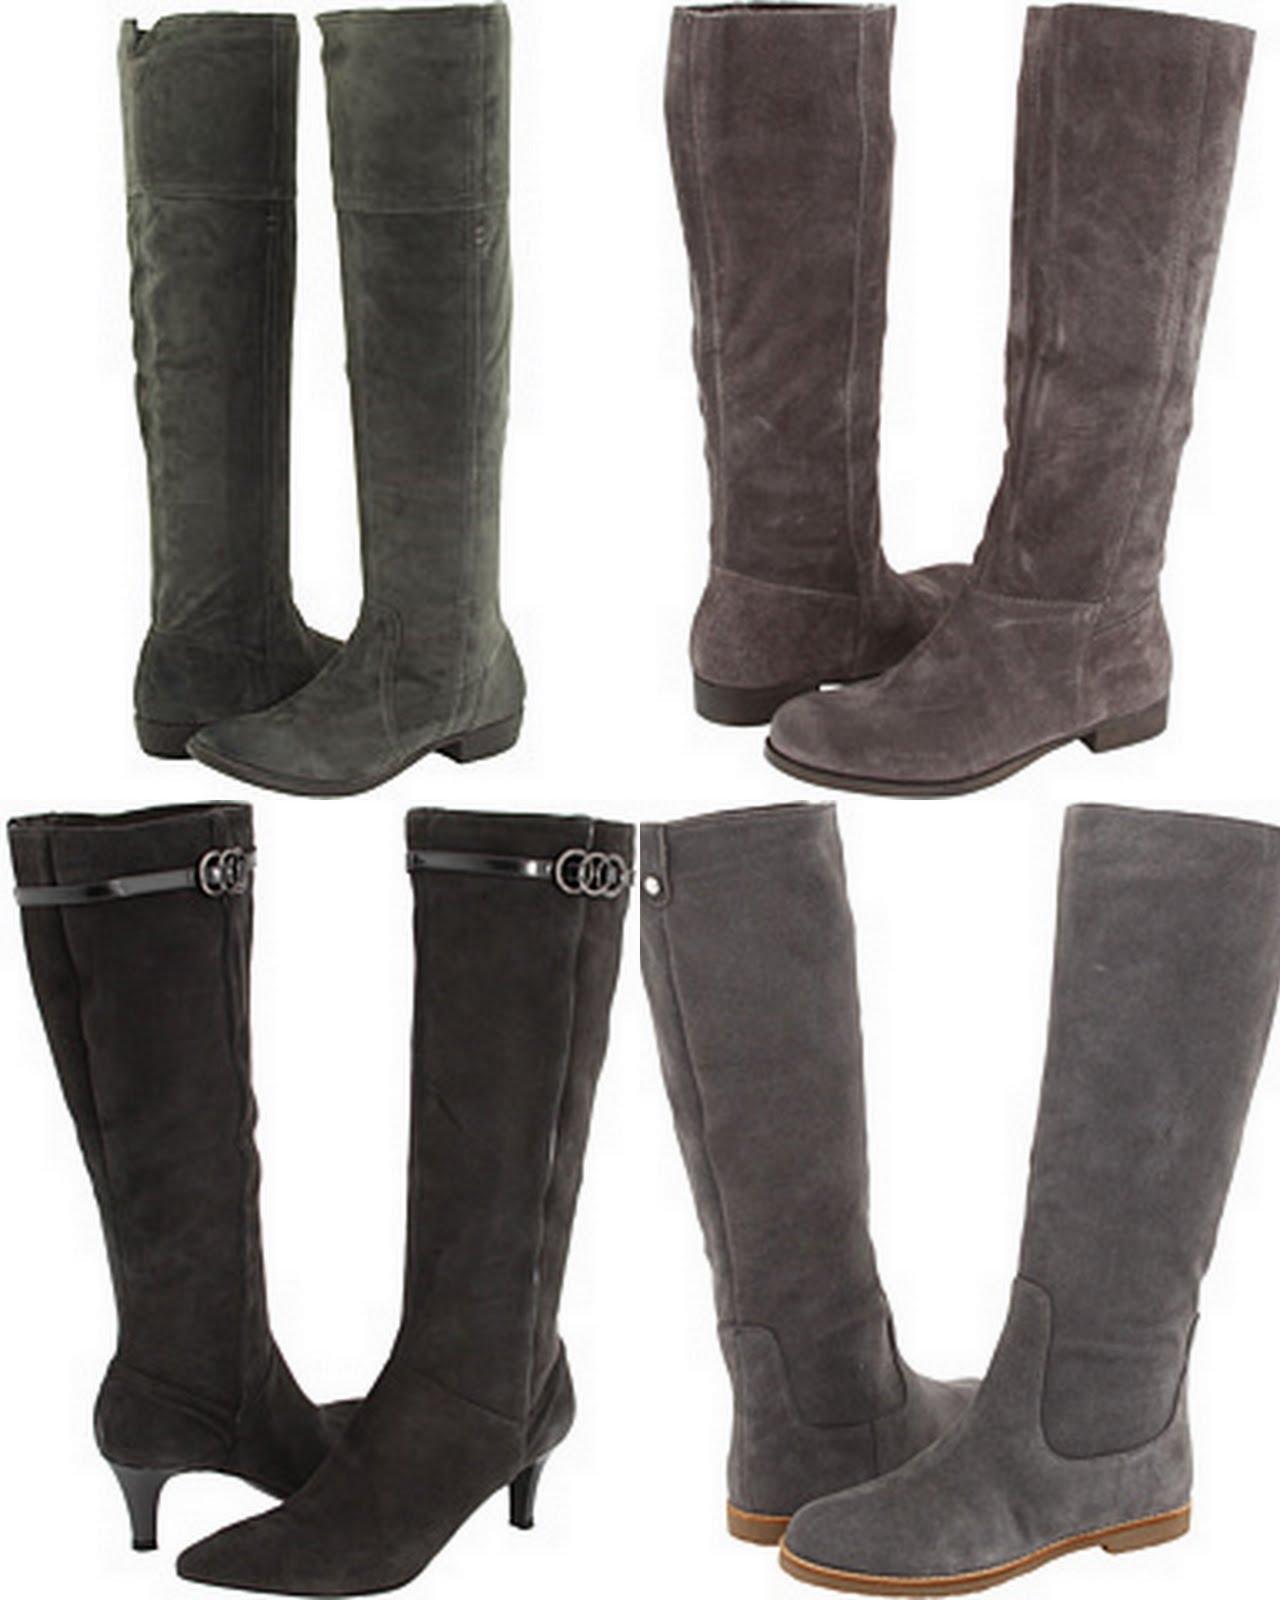 happycozylife wanted grey boots